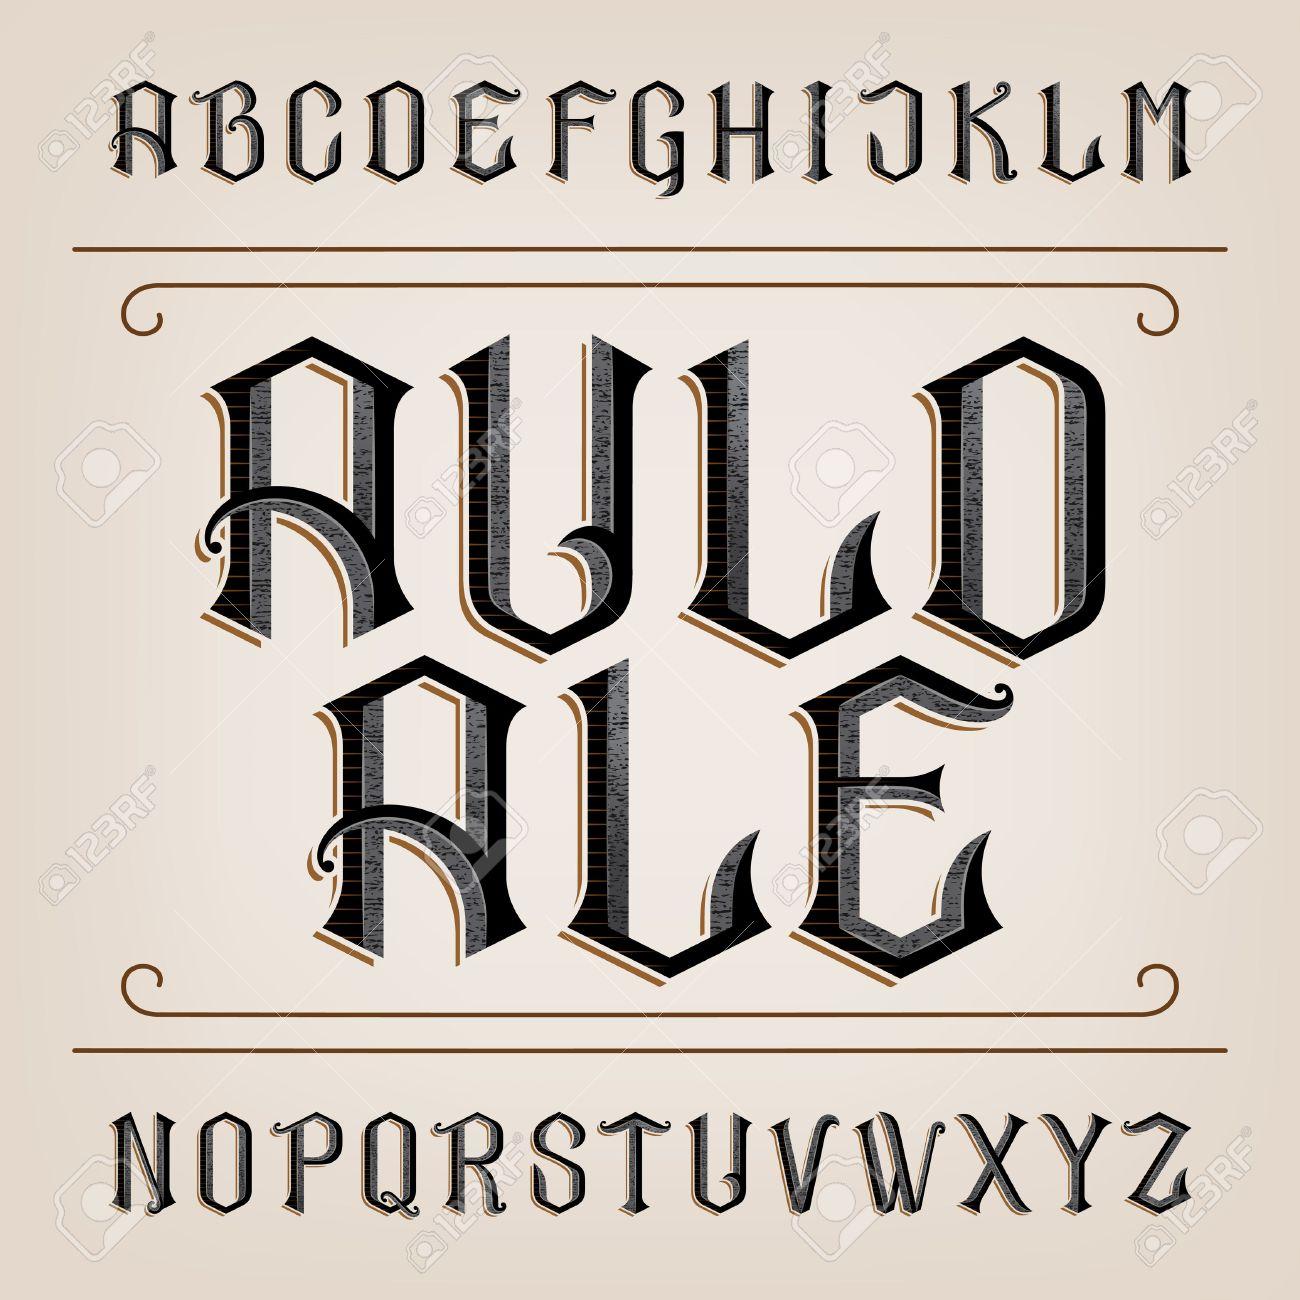 Old alphabet font. Distressed hand drawn letters. Vintage alphabet for labels, headlines, posters etc. - 57947833